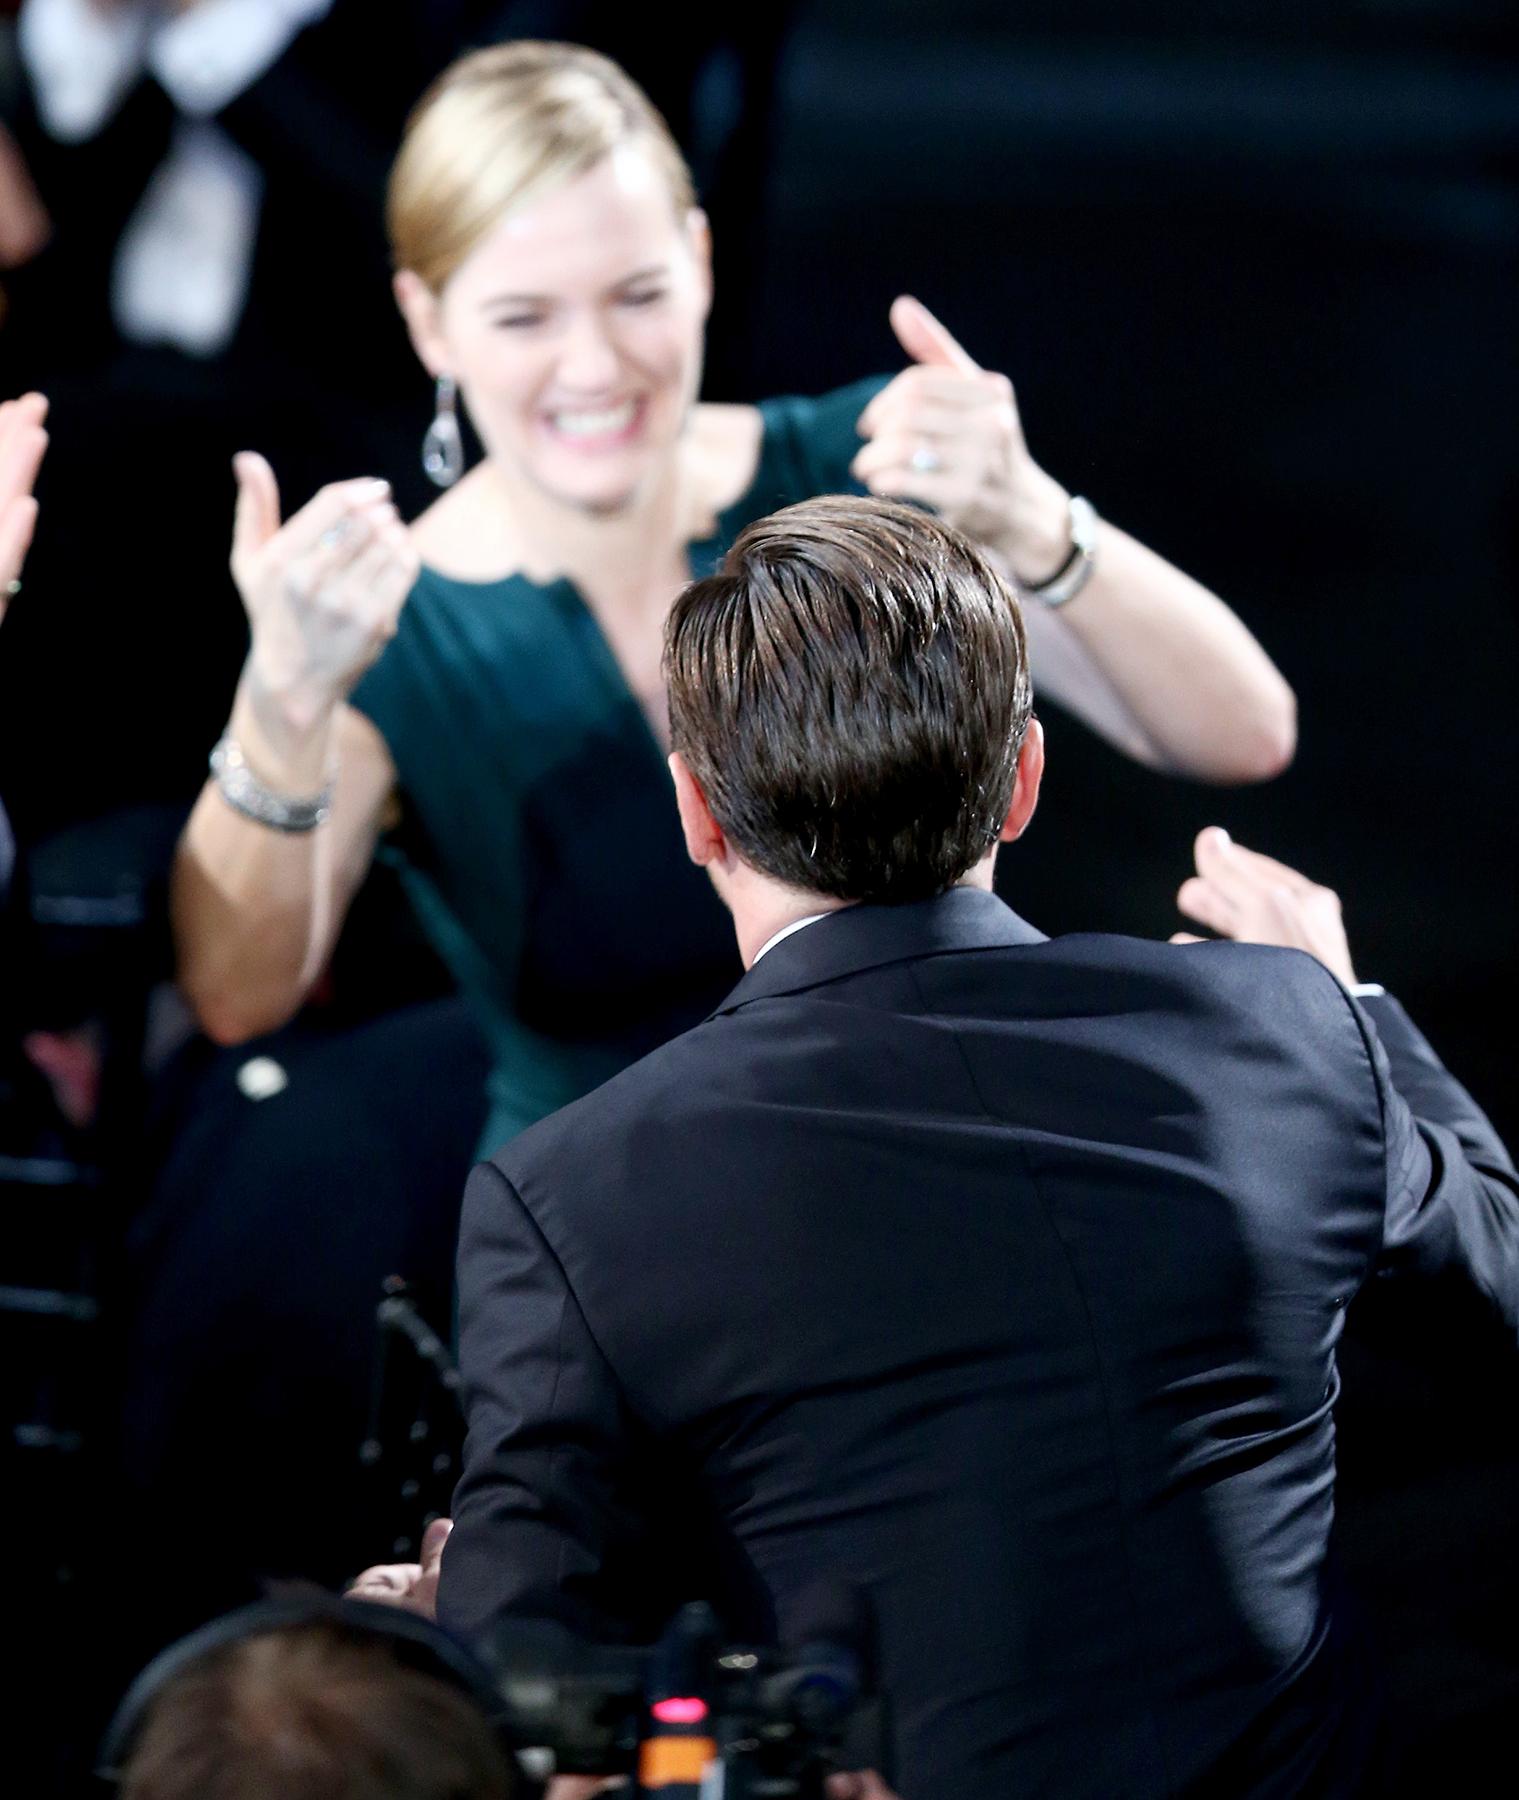 Kate Winslet and Leonardo DiCaprio hugging